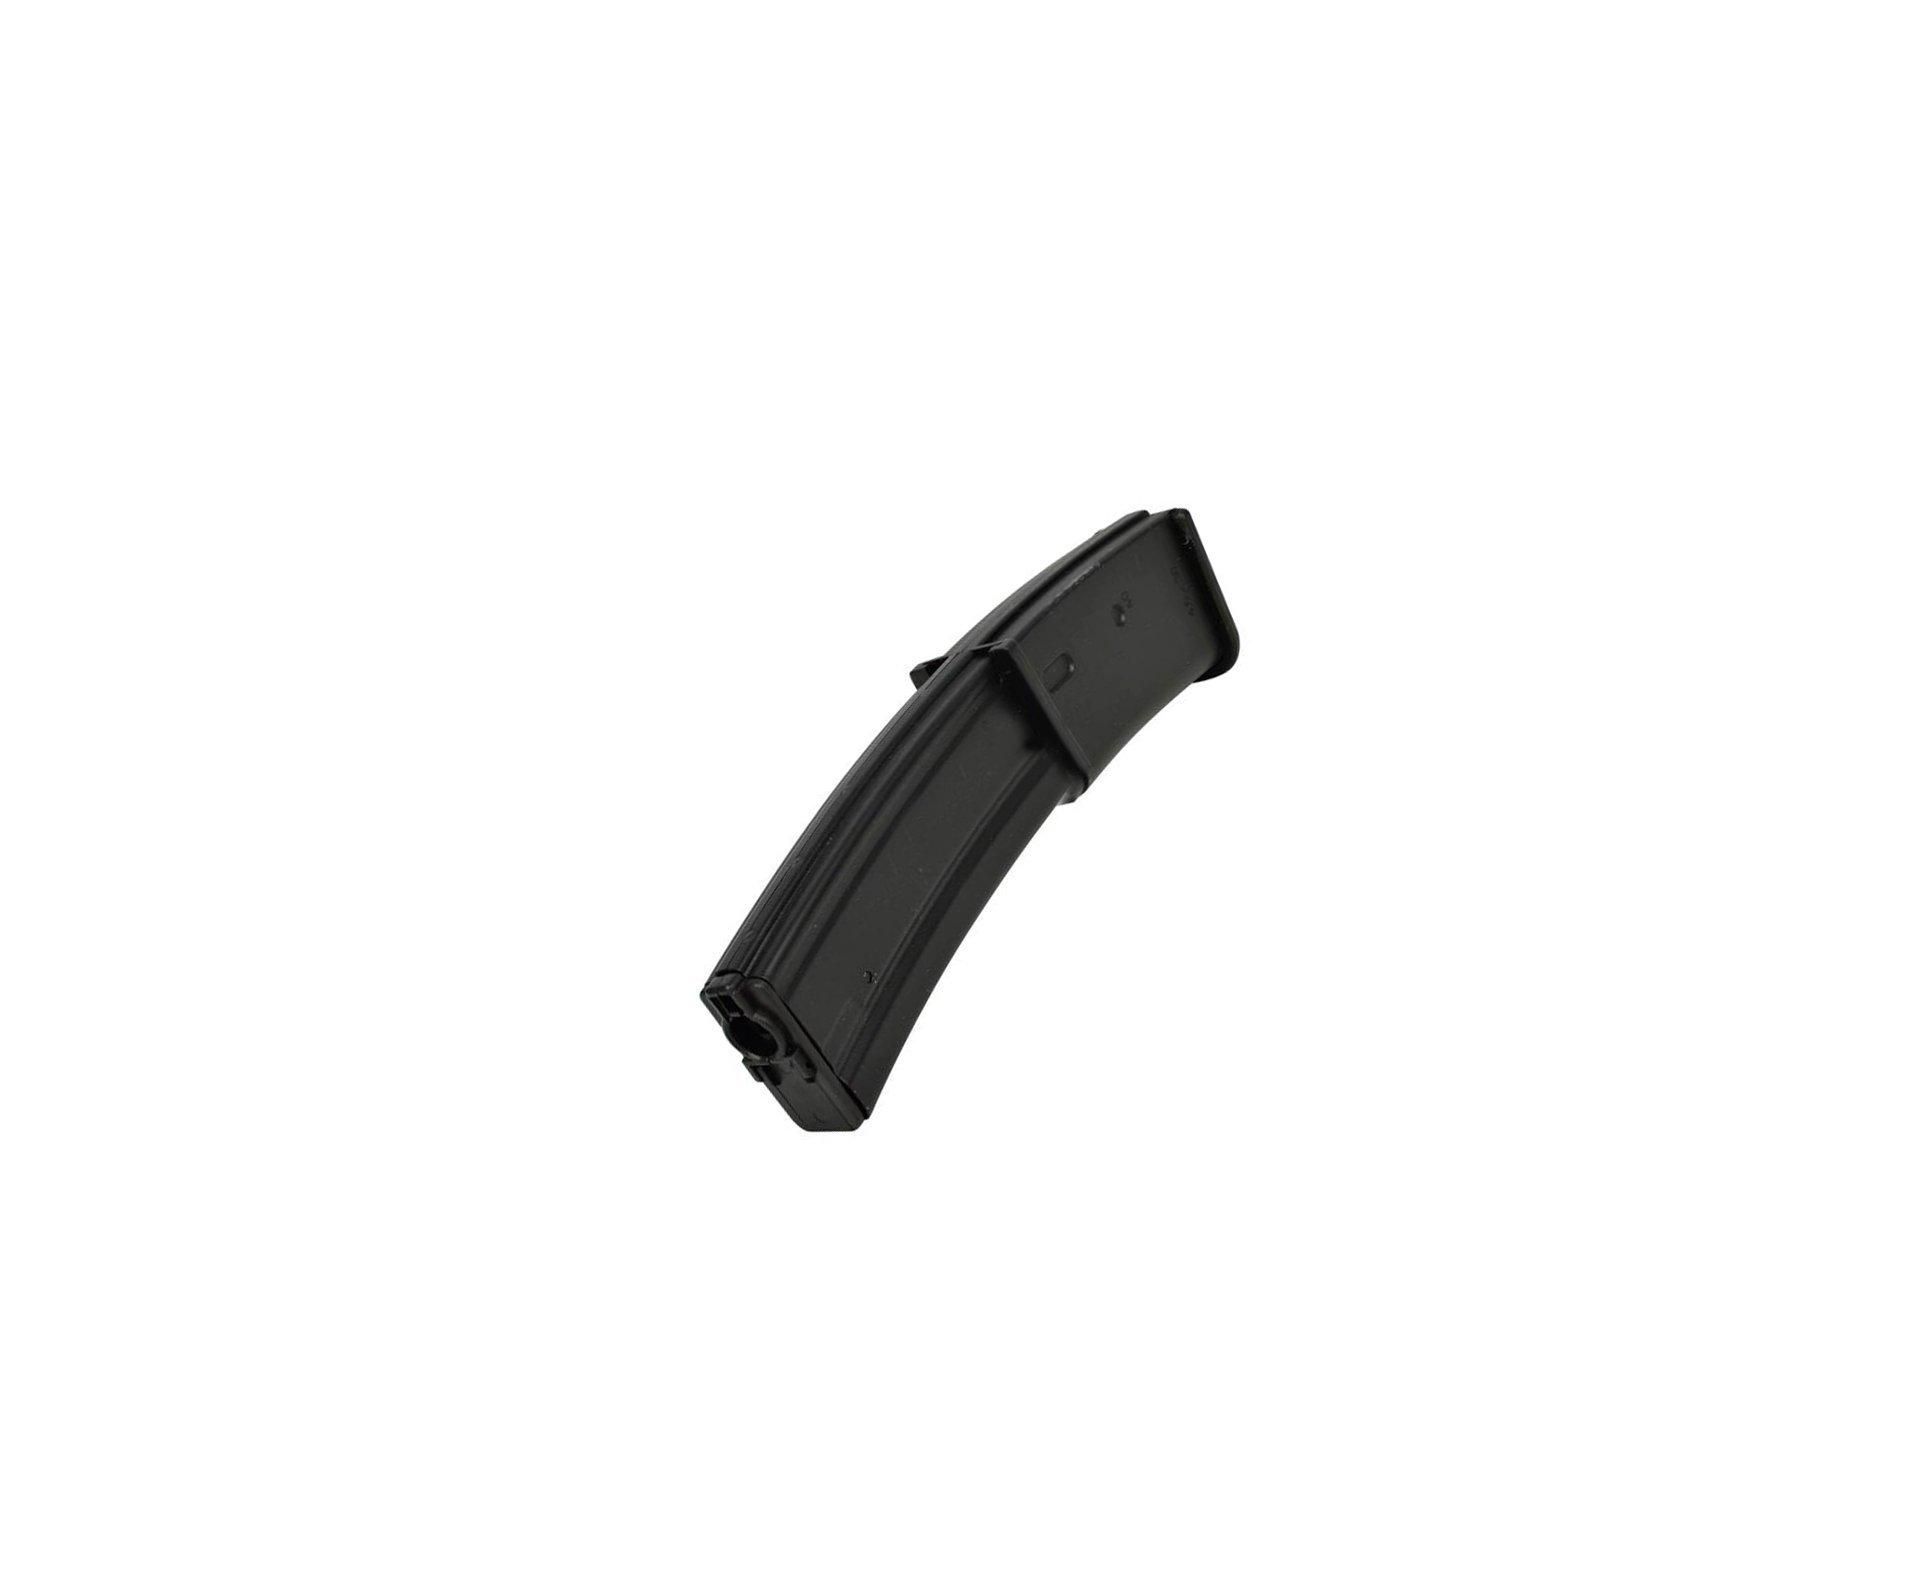 Magazine Para Airsoft  Hek Mp7 A1 Elet 6mm - Cyber Gun